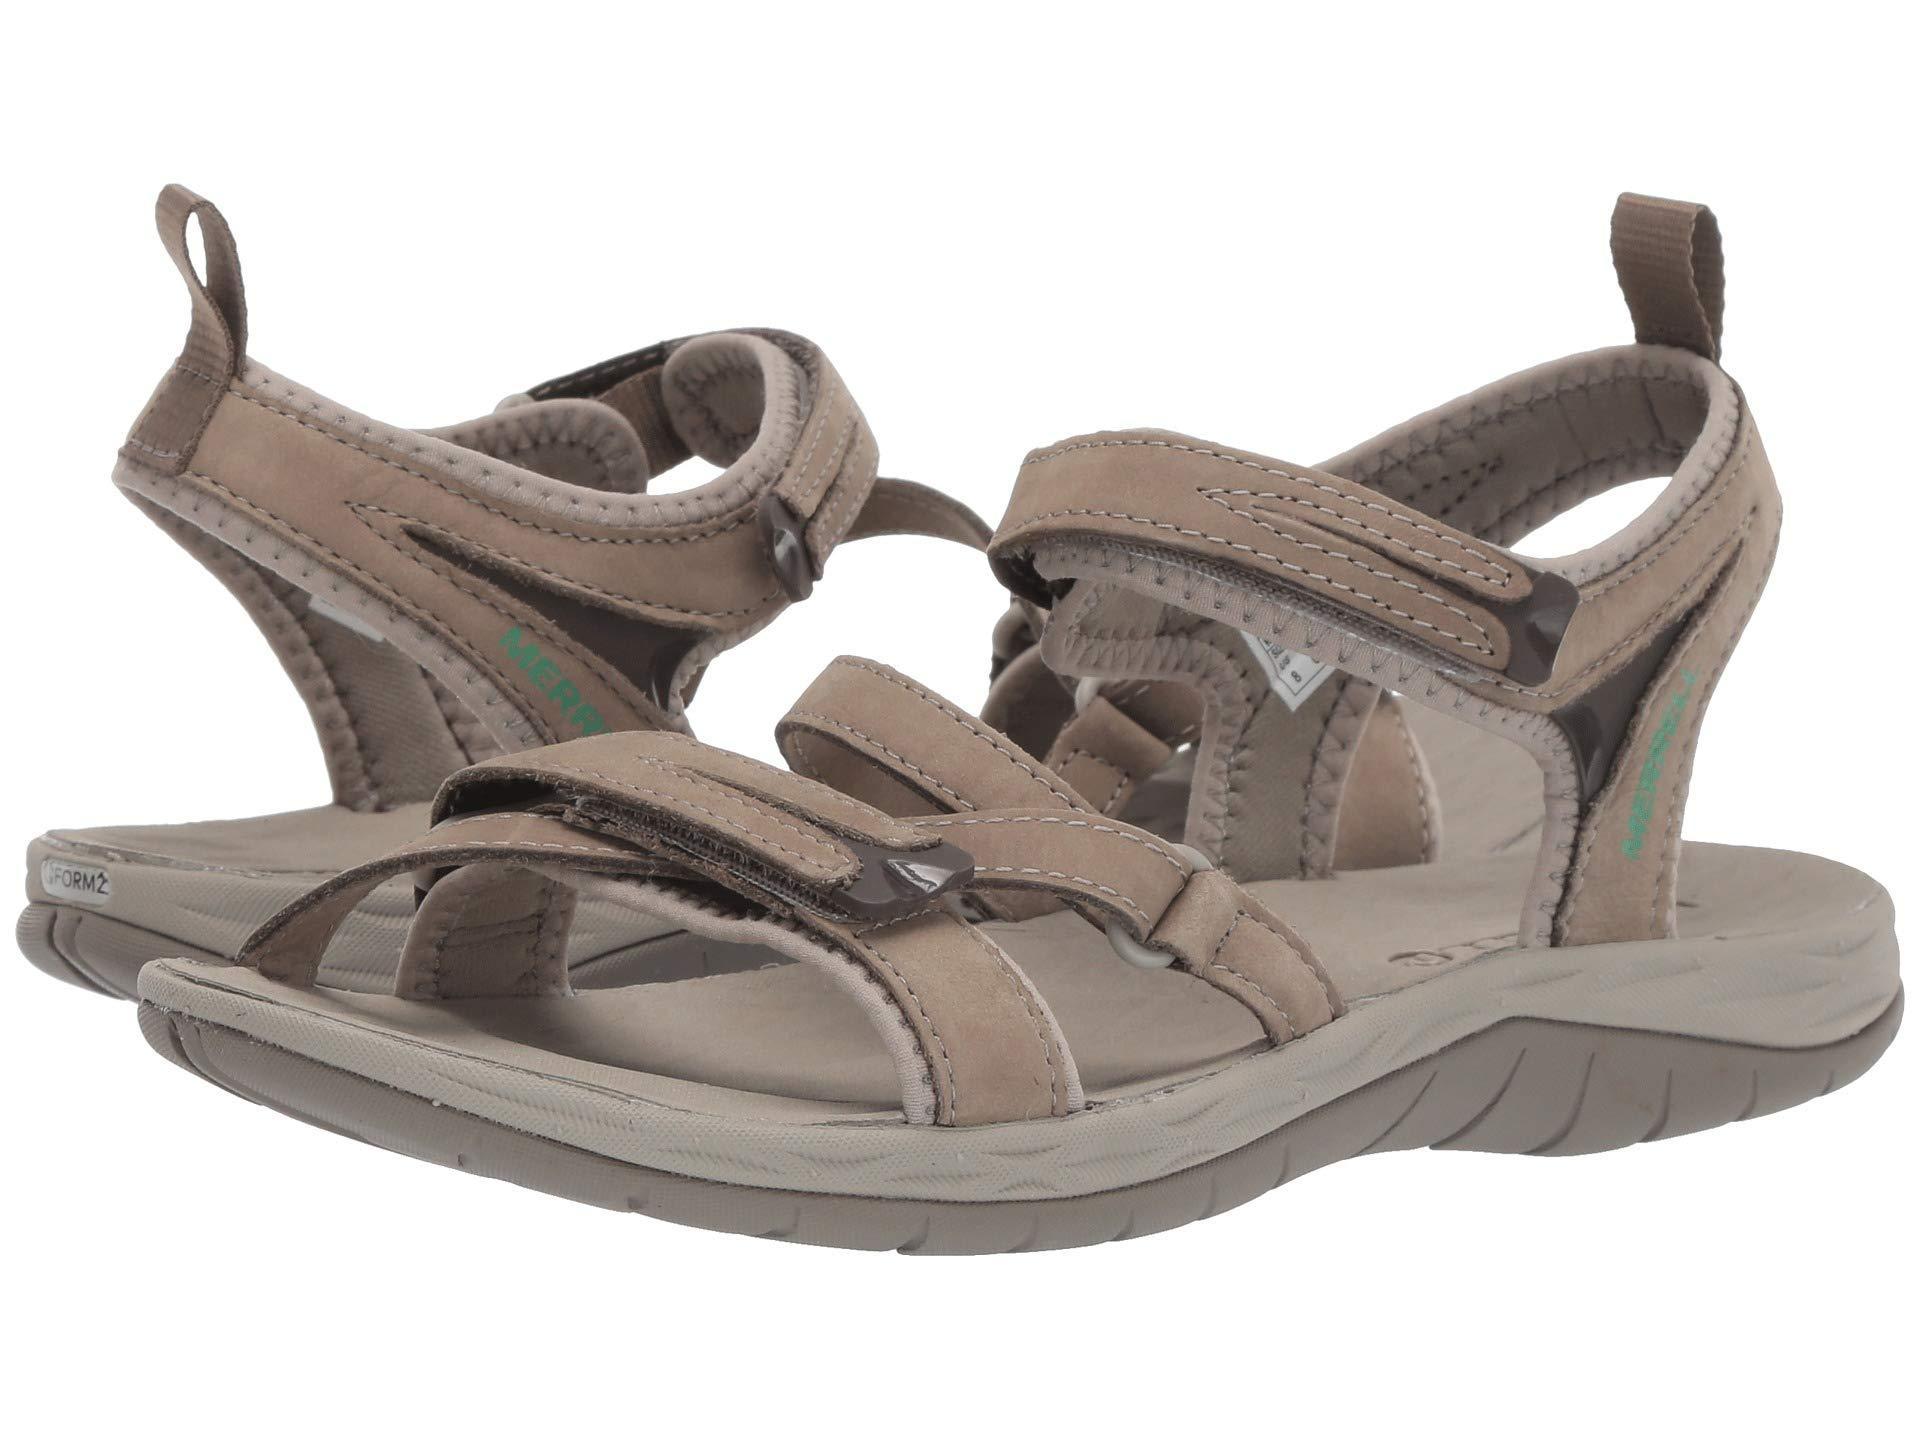 afeb9b93f2ca Merrell - Multicolor Siren Strap Q2 (black) Women s Sandals - Lyst. View  fullscreen